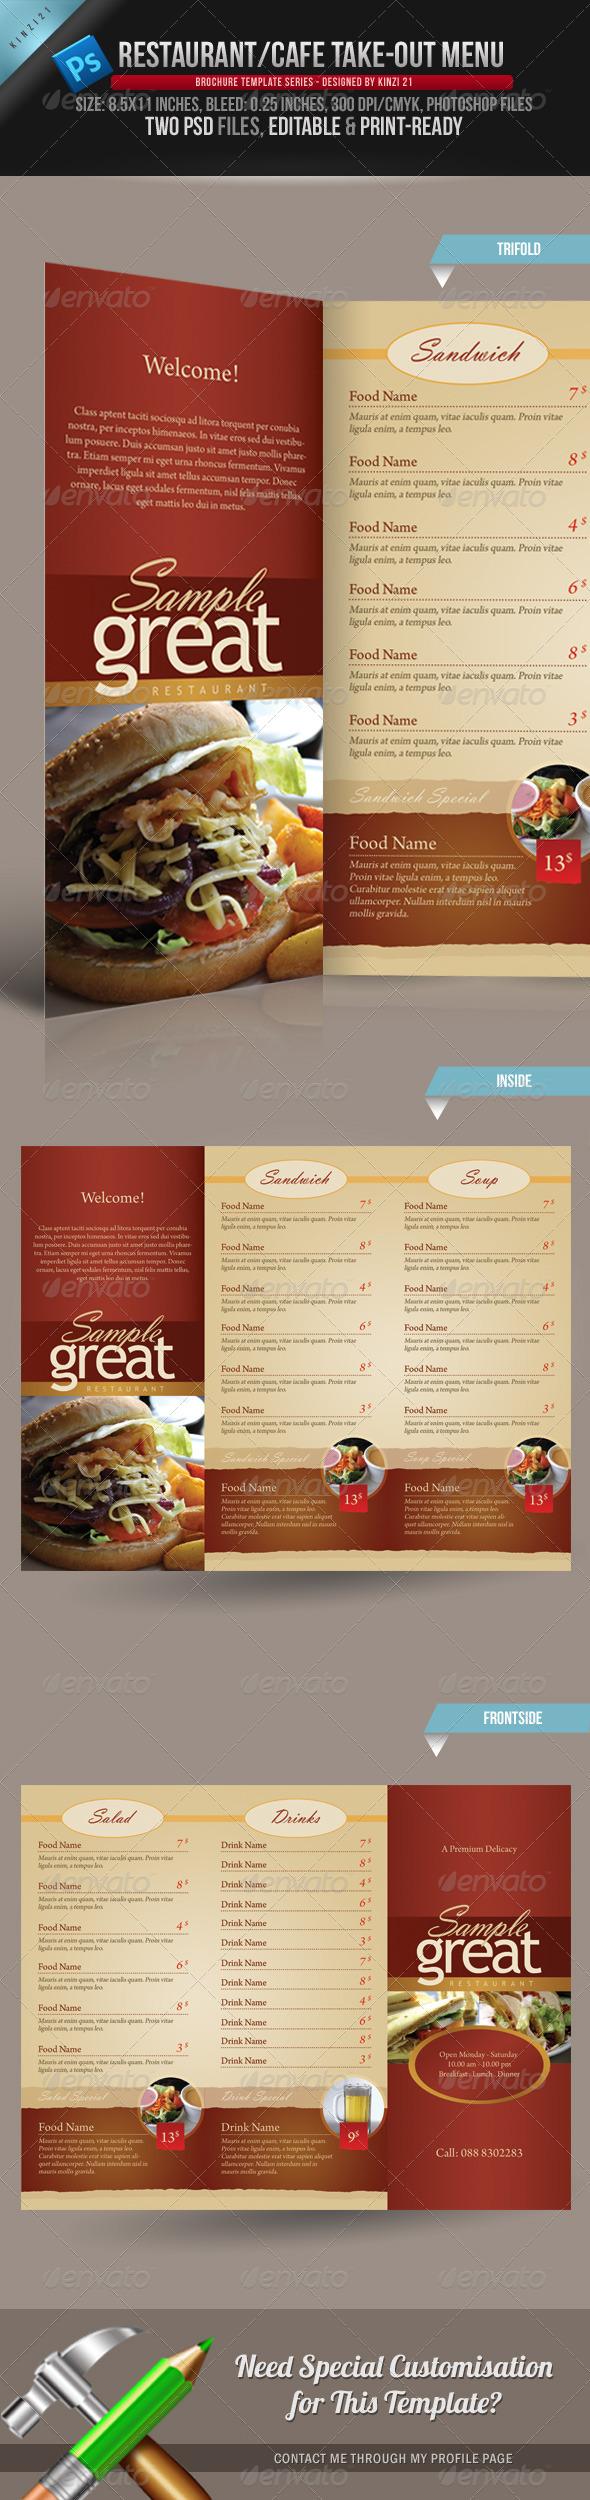 GraphicRiver Restaurant Cafe Take-out Menu Template 160495